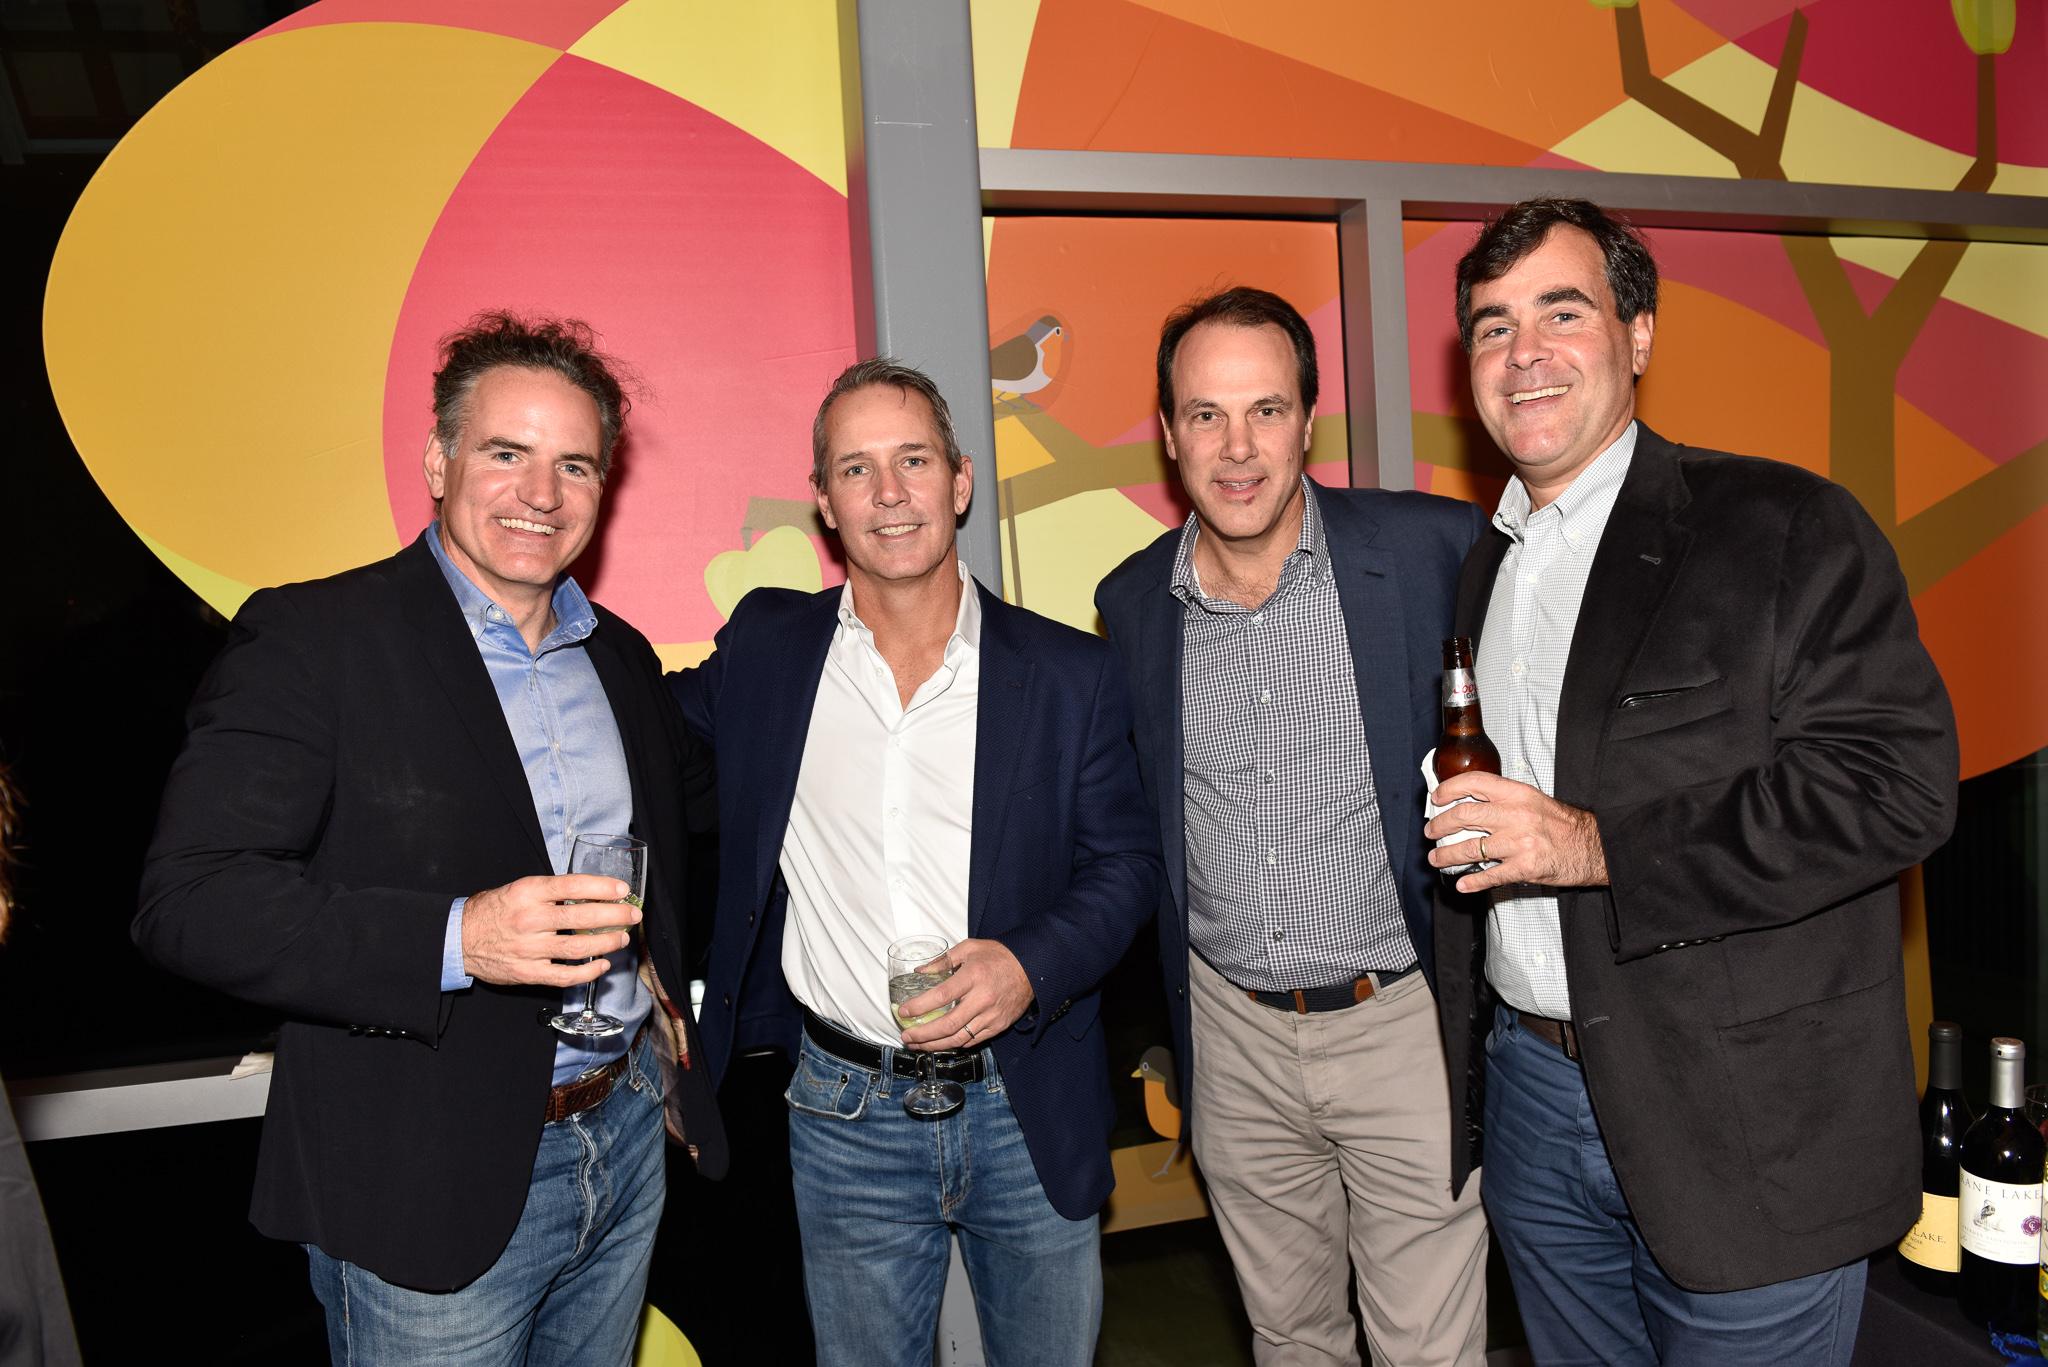 Kevin Callahan, Brad Elders, Ward Glassmeyer, Mitch Truit